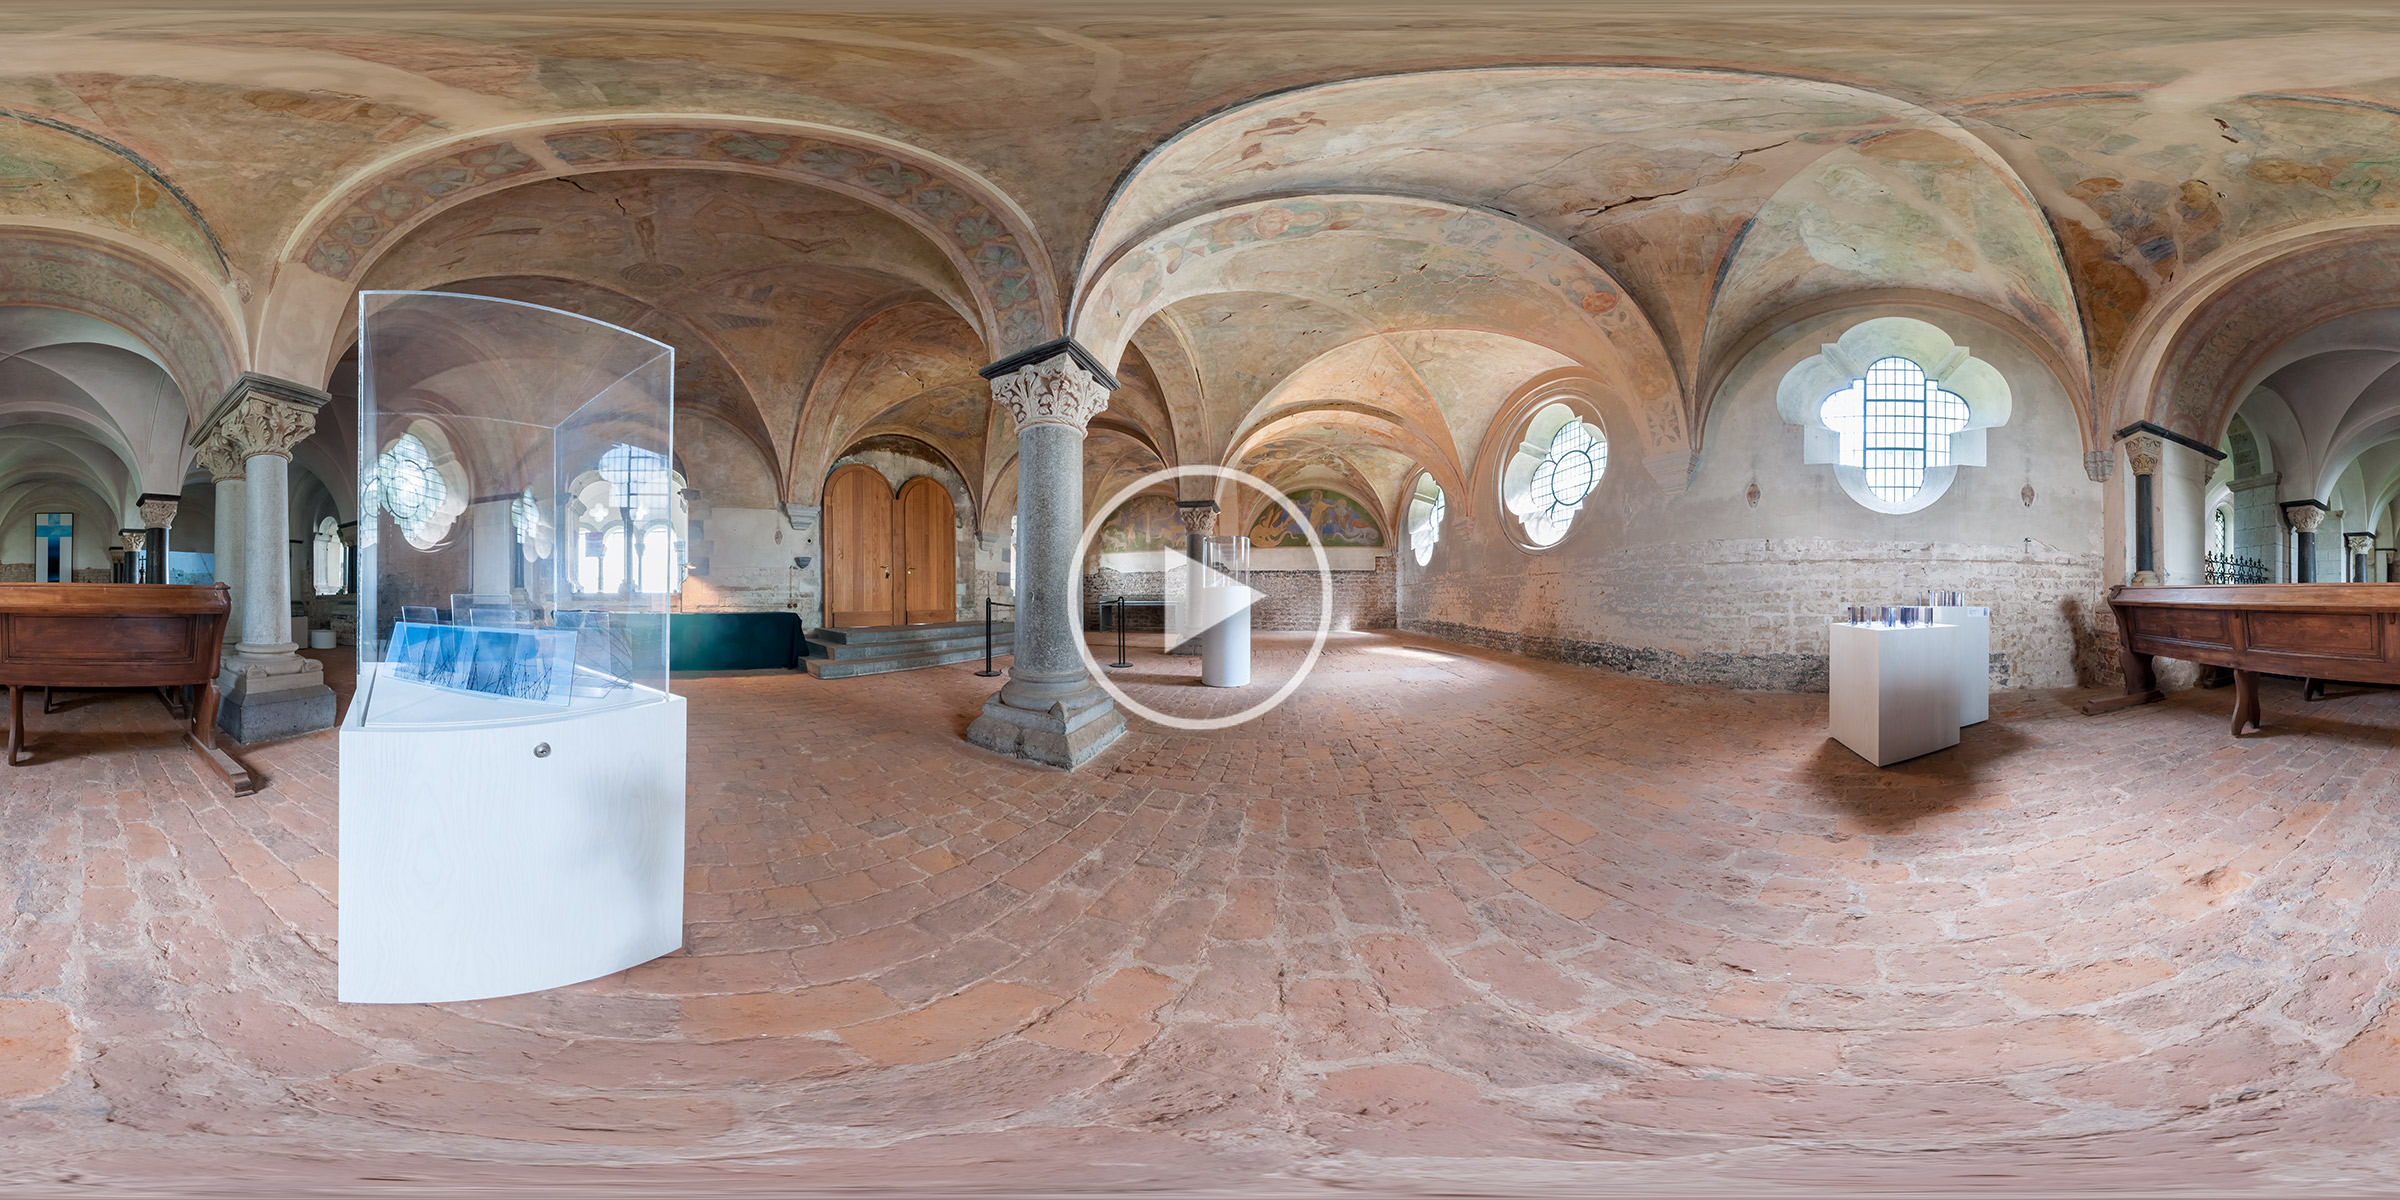 Kapitelsaal Abtei Brauweiler